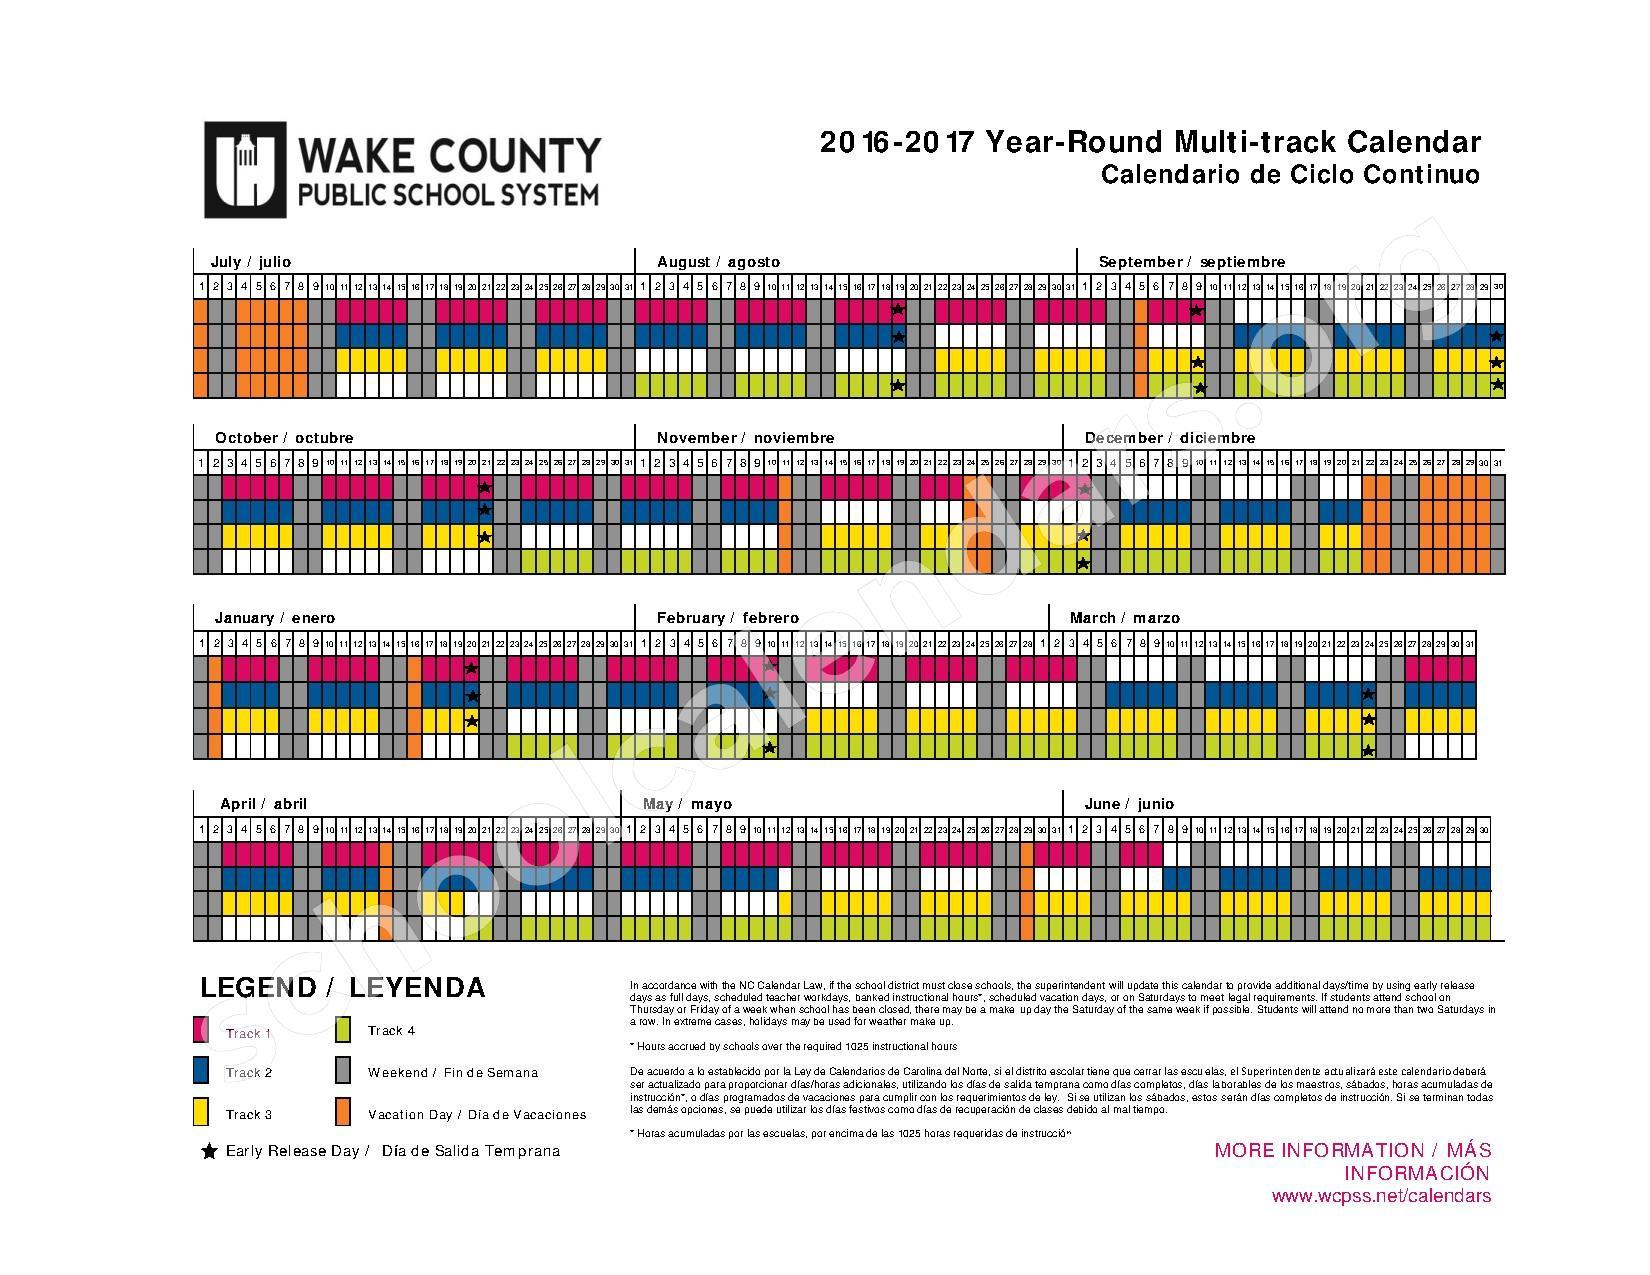 2016 - 2017 Year-Round Calendar – Jones Dairy Elementary School – page 1